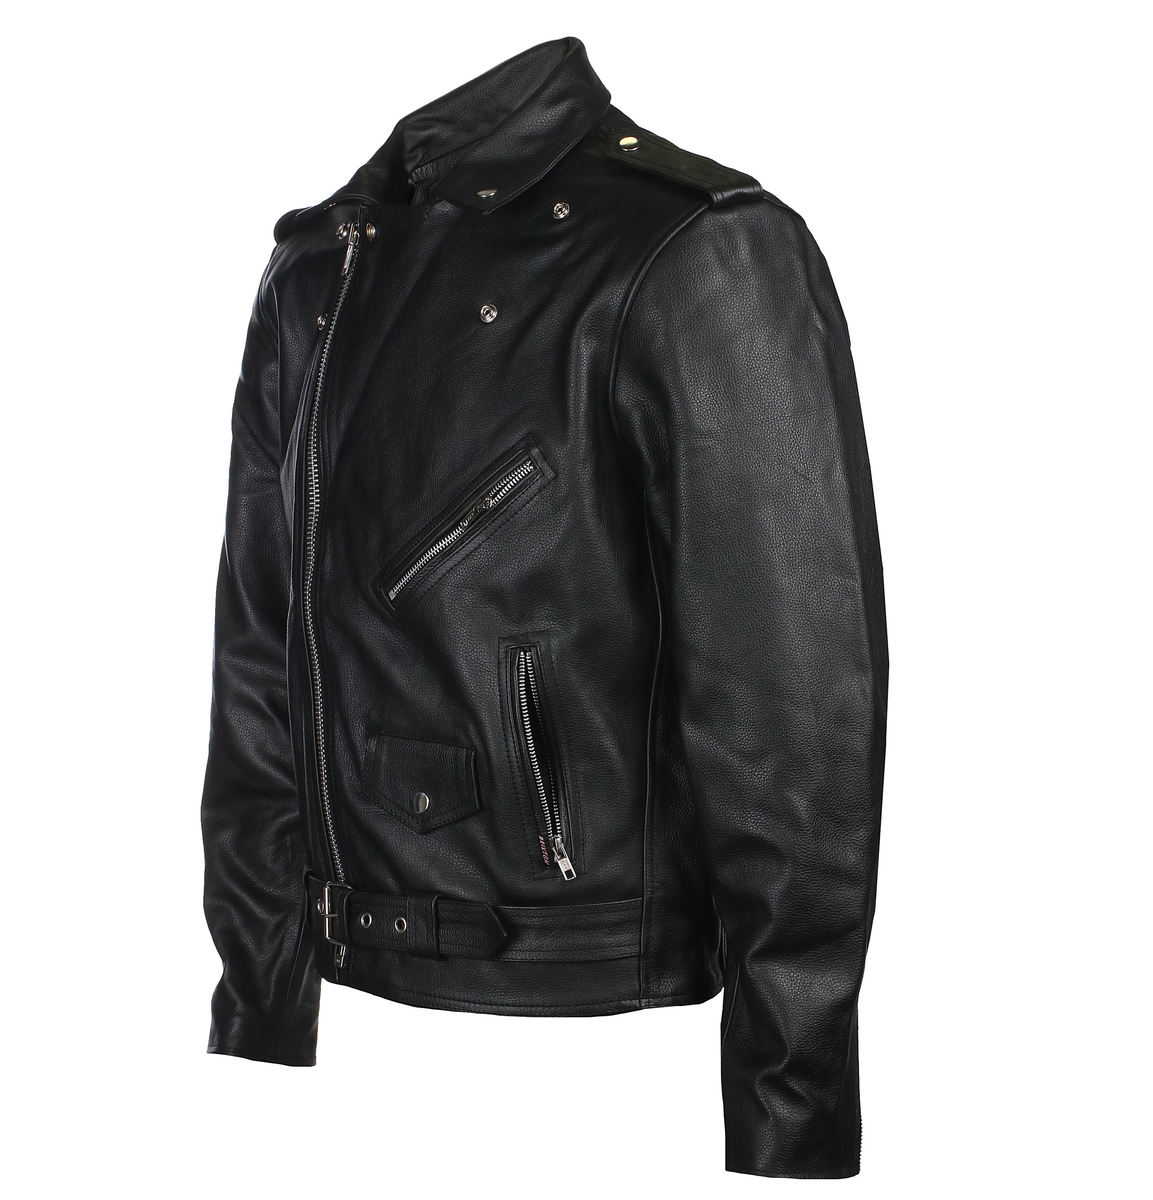 e48e69055b bőr csizma női - STEEL - 105/106 Black 10 fűzőlyuk-cipő